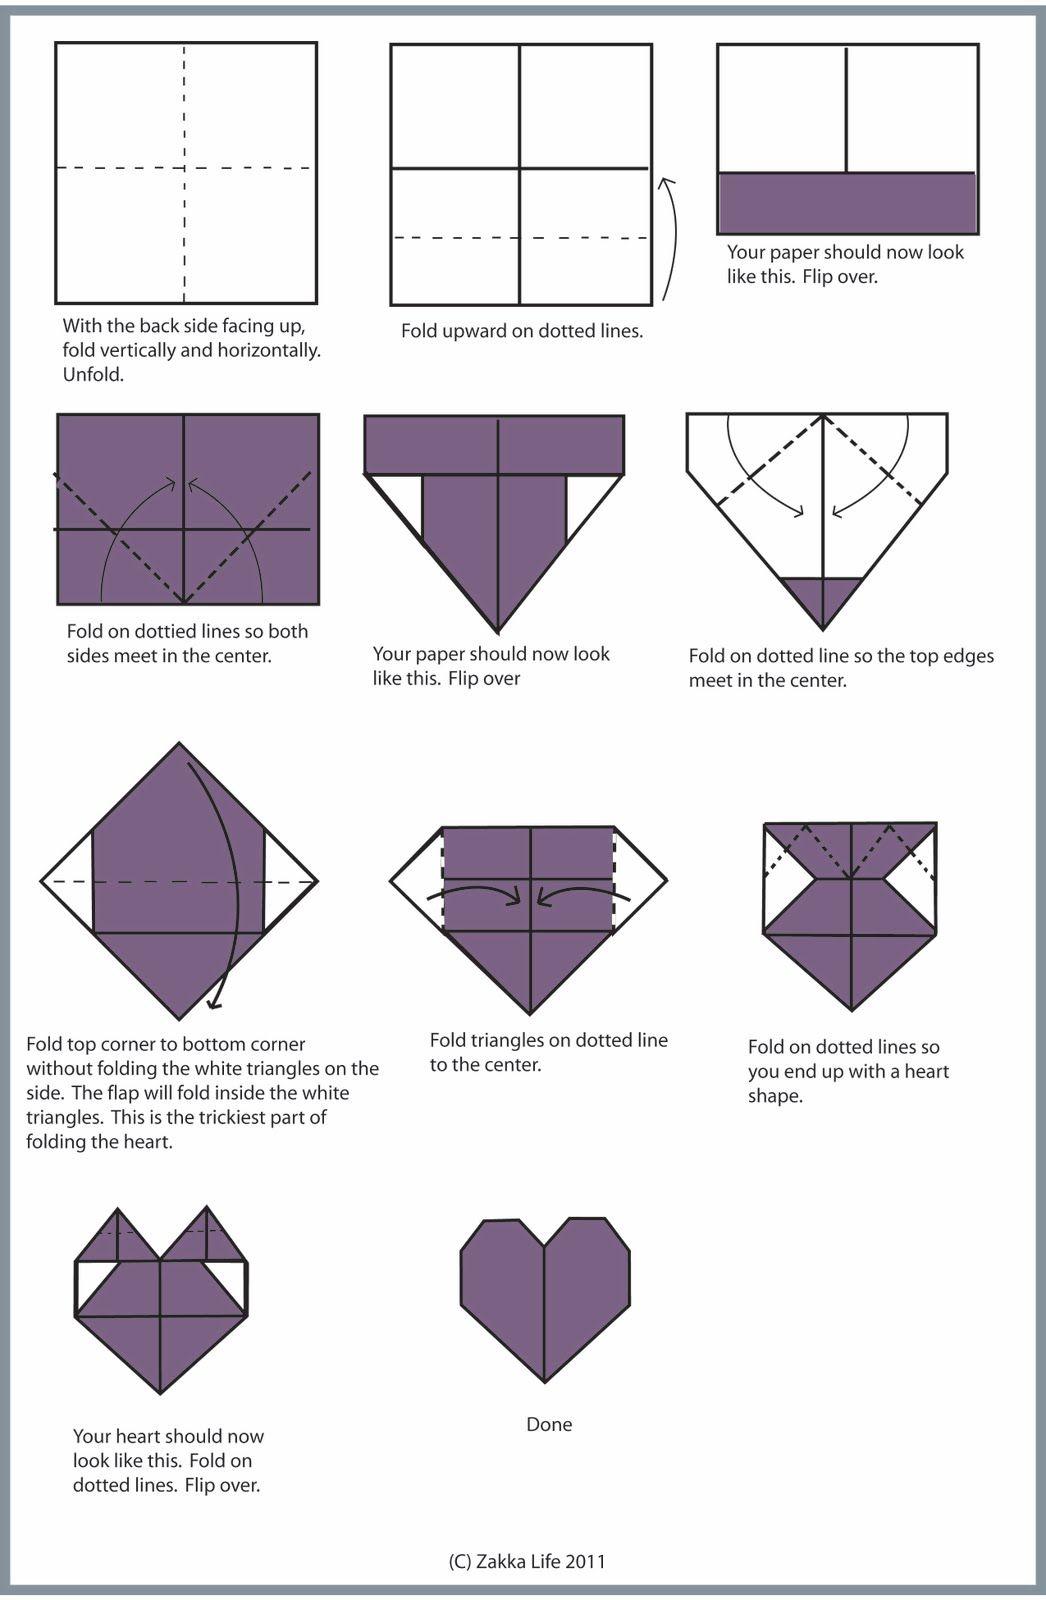 zakka life craft origami heart valentines crafts pinterest rh pinterest com origami heart instructions easy origami instructions heart with wings